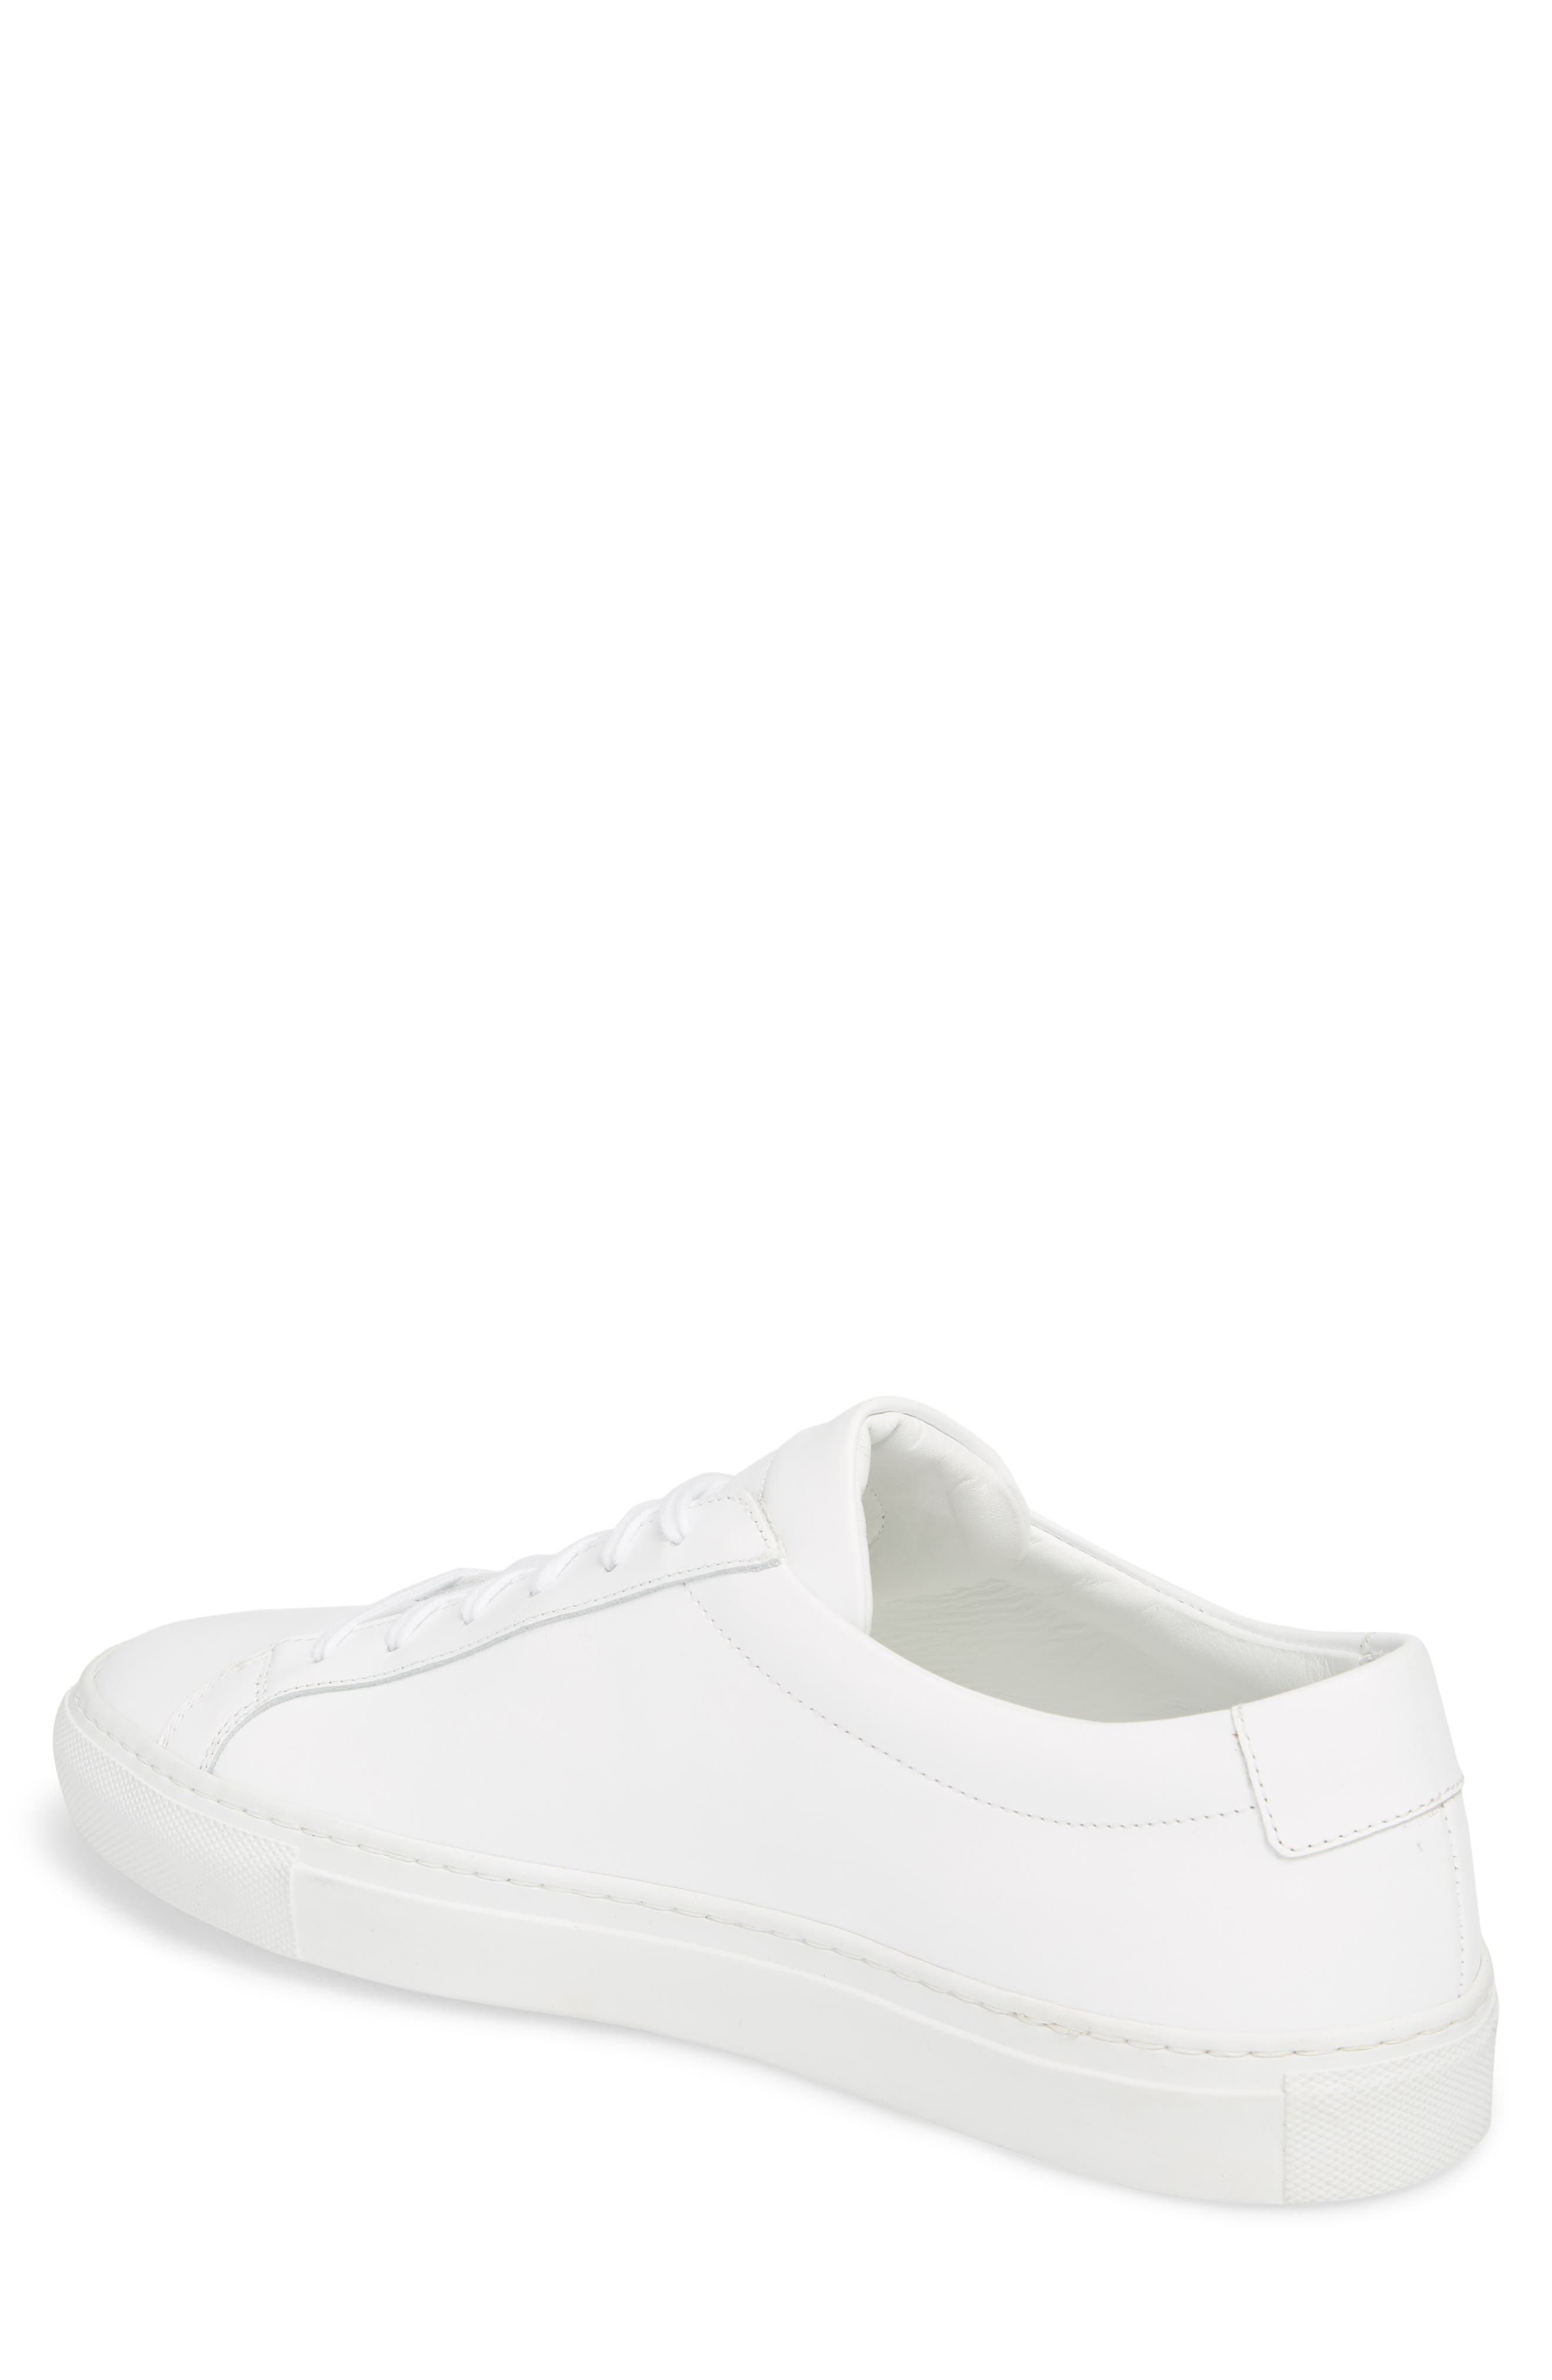 COMMON PROJECTS, Original Achilles Sneaker, Alternate thumbnail 2, color, WHITE